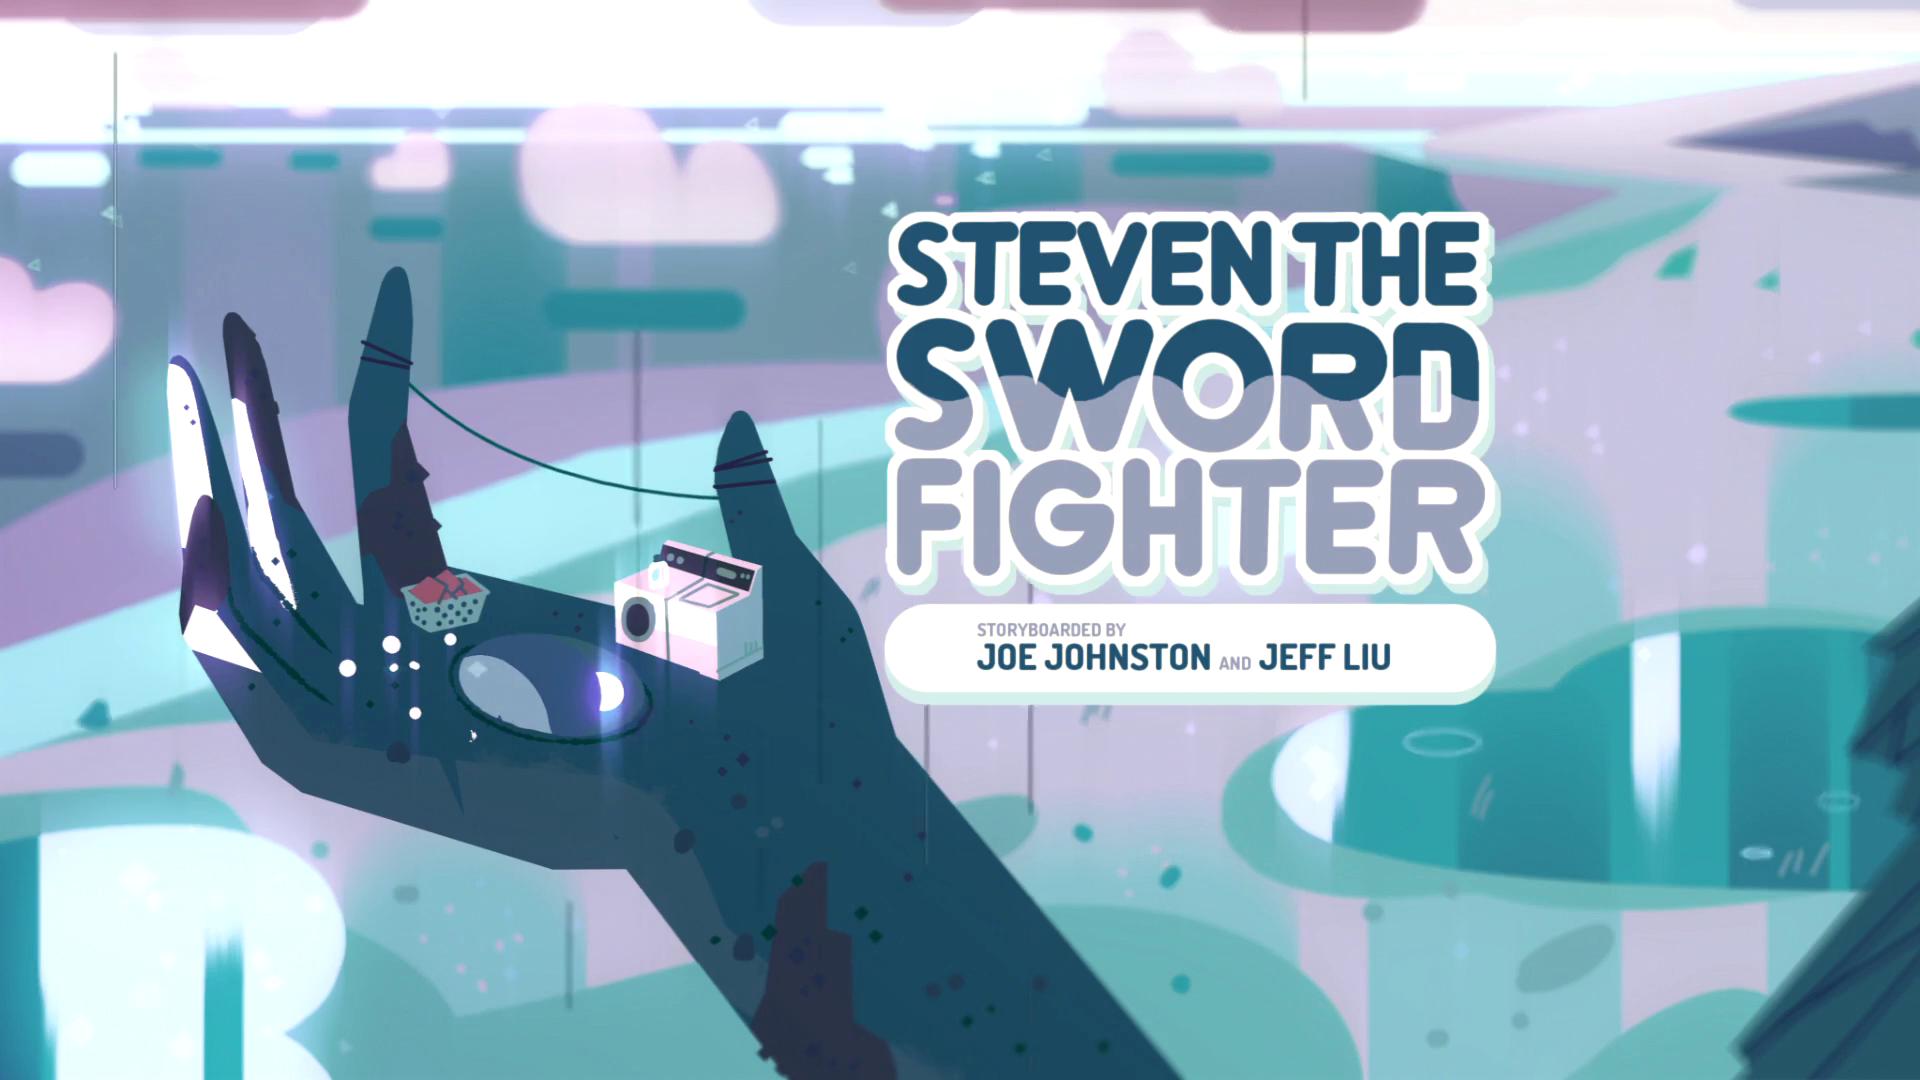 Steven the Sword Fighter/Gallery